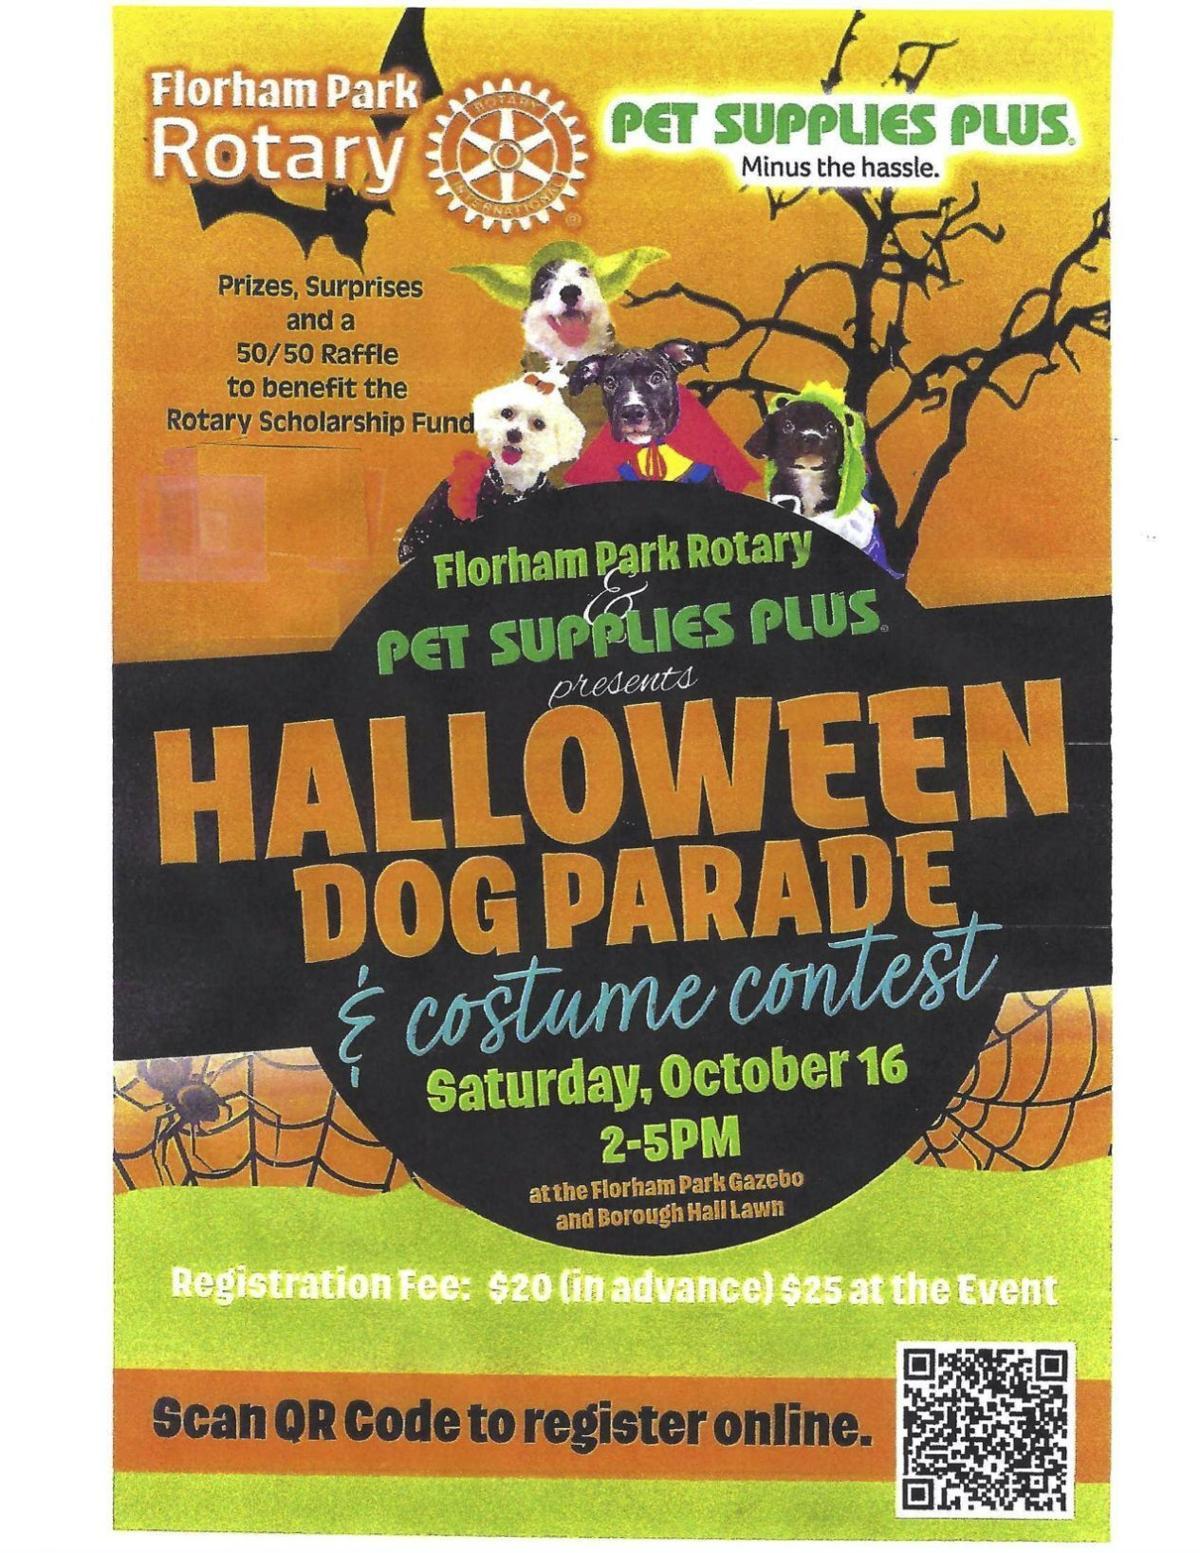 Halloween dog parade Oct. 16 in Florham Park